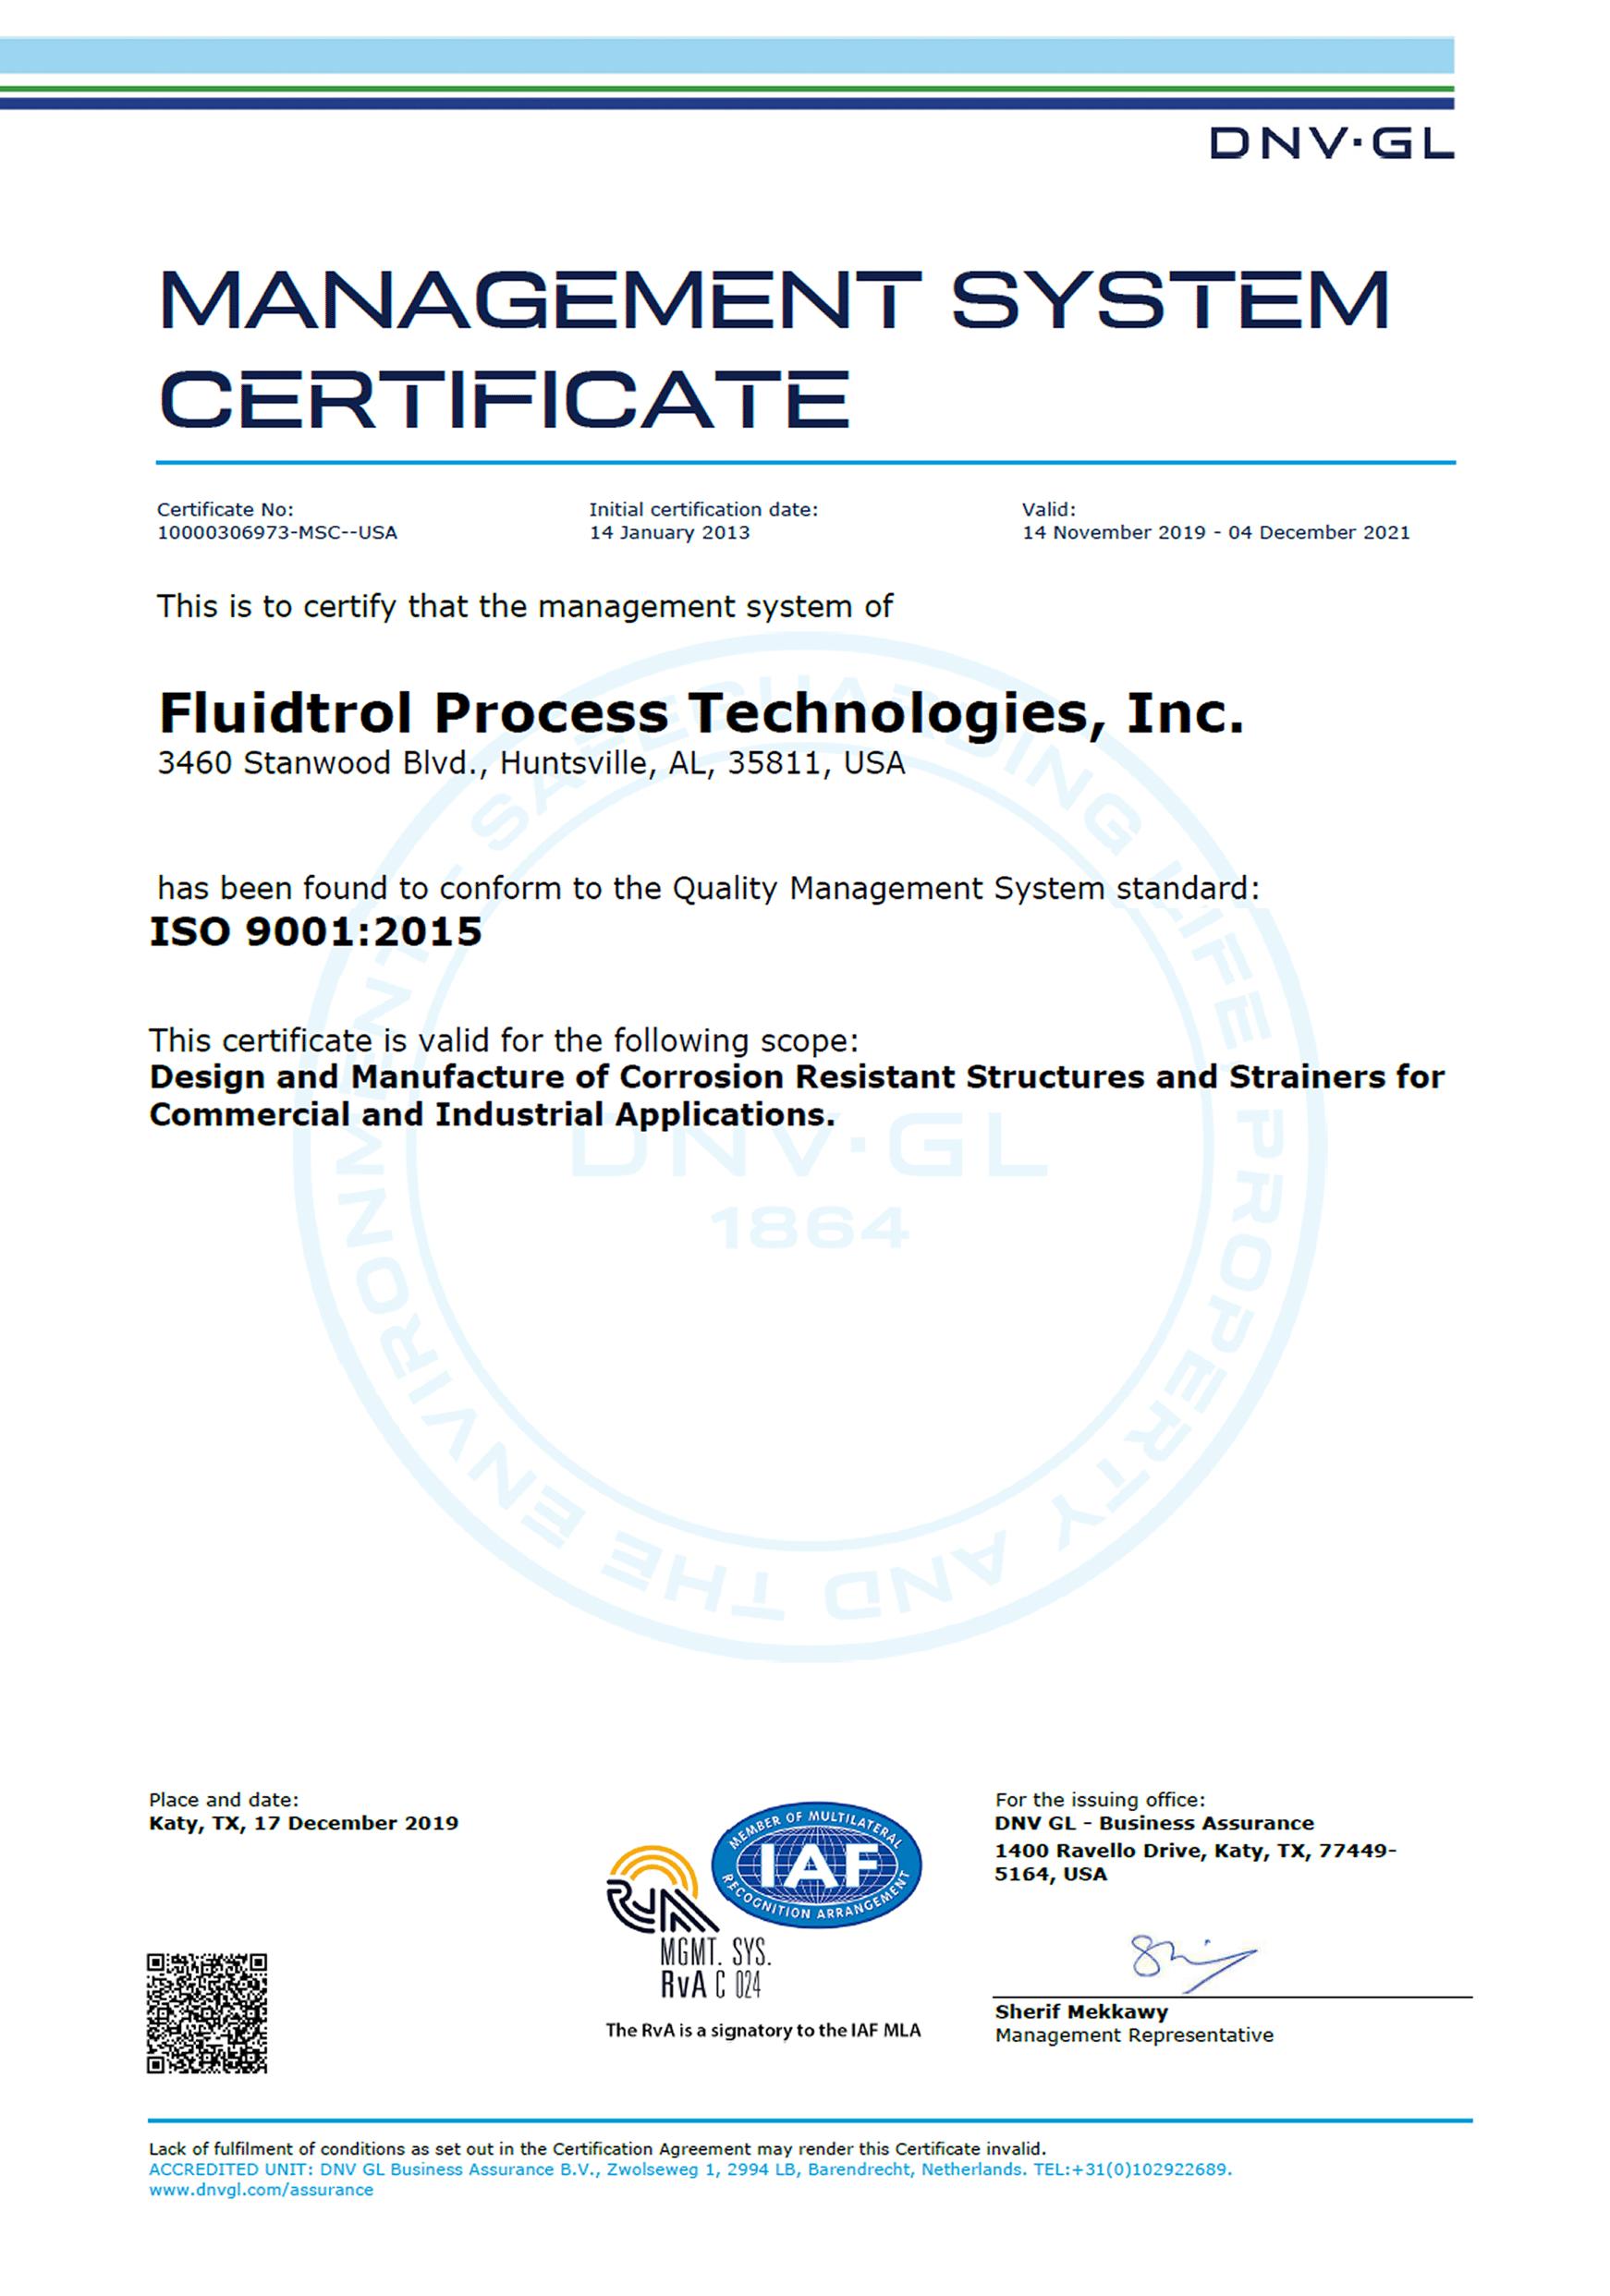 RvA ISO9001:2015 Cetrtificate